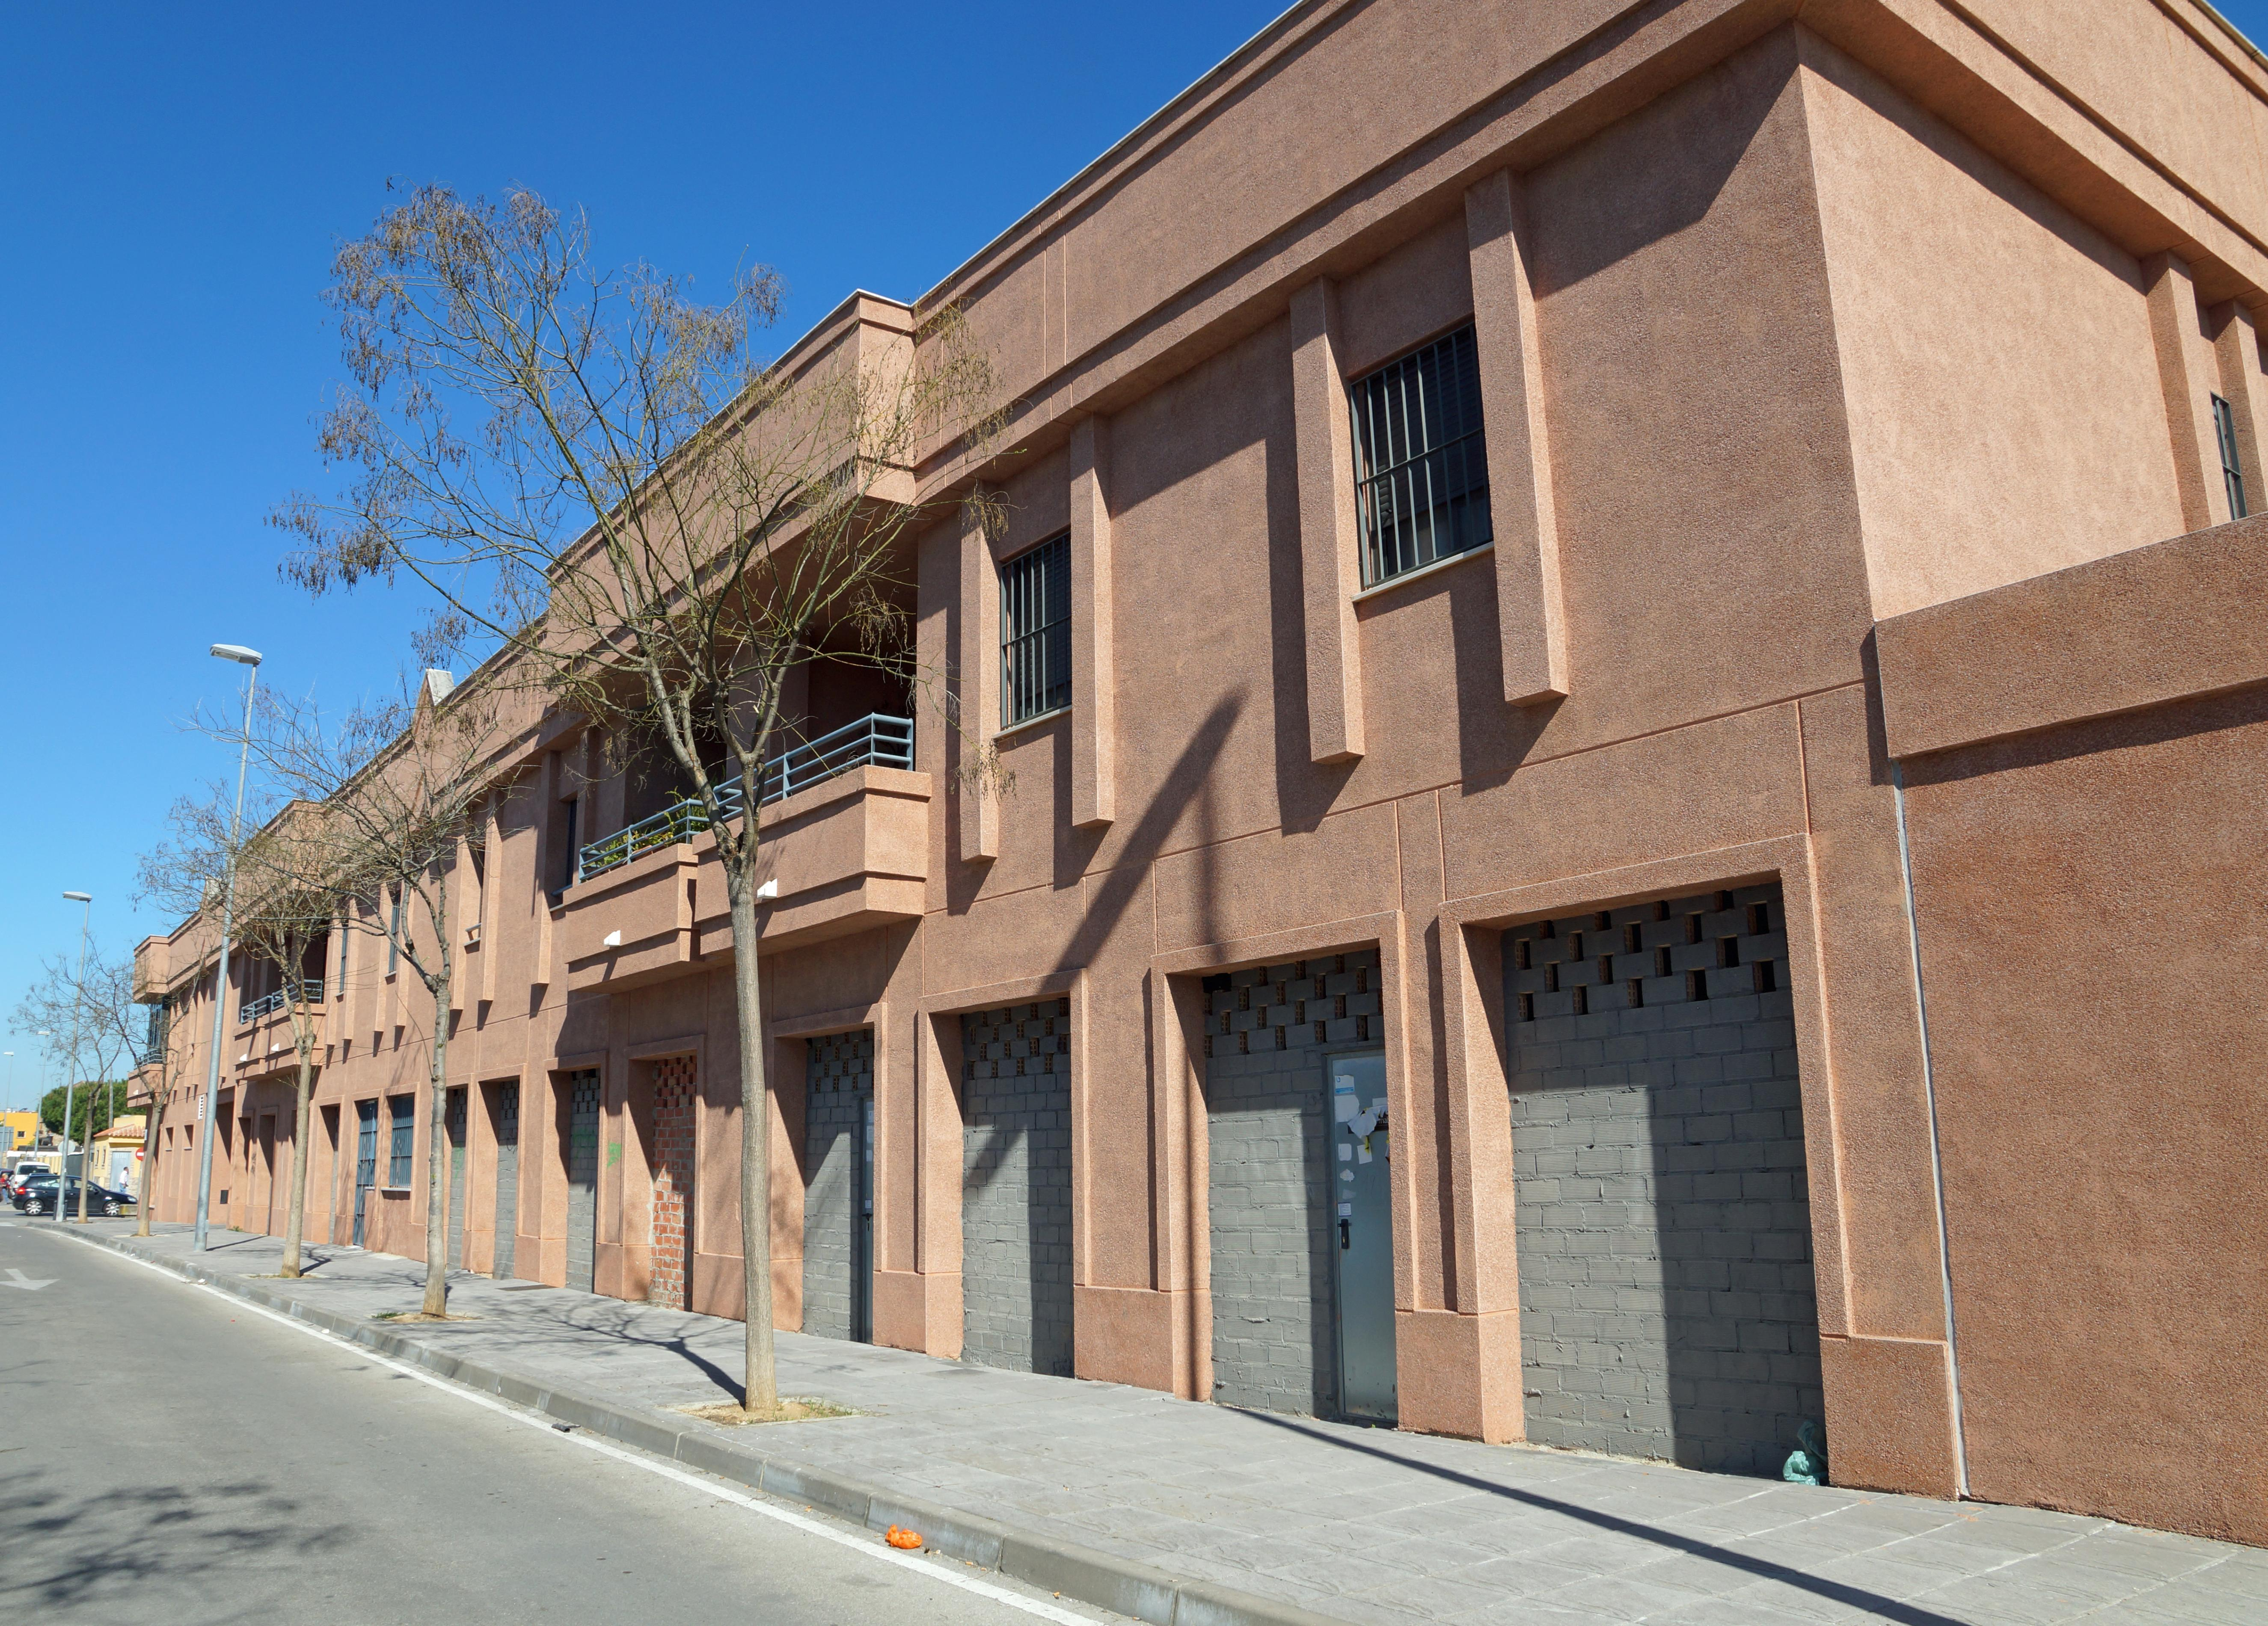 Local en venta en Estella del Marqués, Jerez de la Frontera, Cádiz, Calle Periodista Juan Andres Garcia, 47.100 €, 75 m2